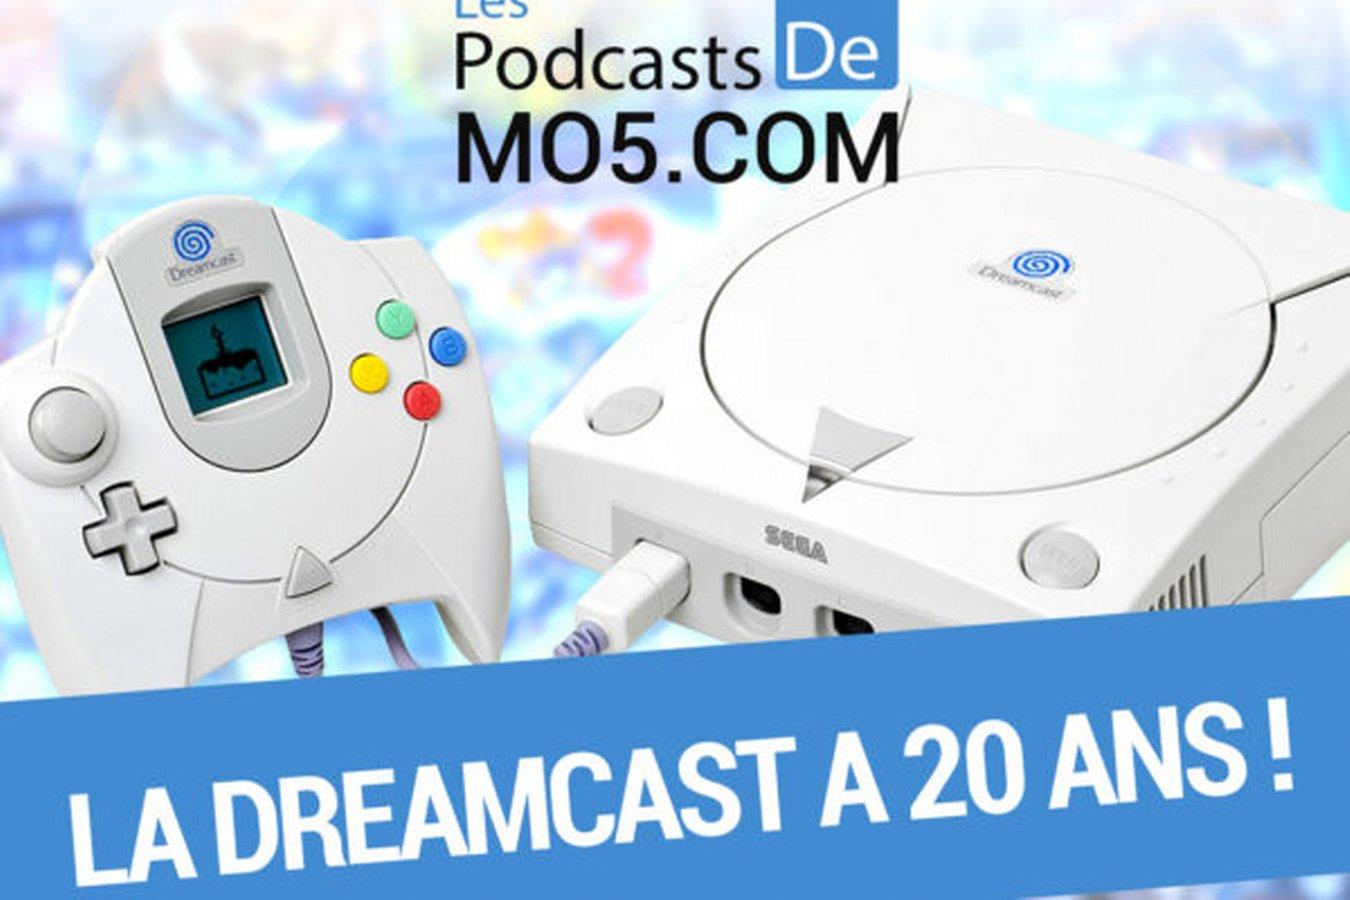 191114Podcast 20AnsDreamcast MiniatSite